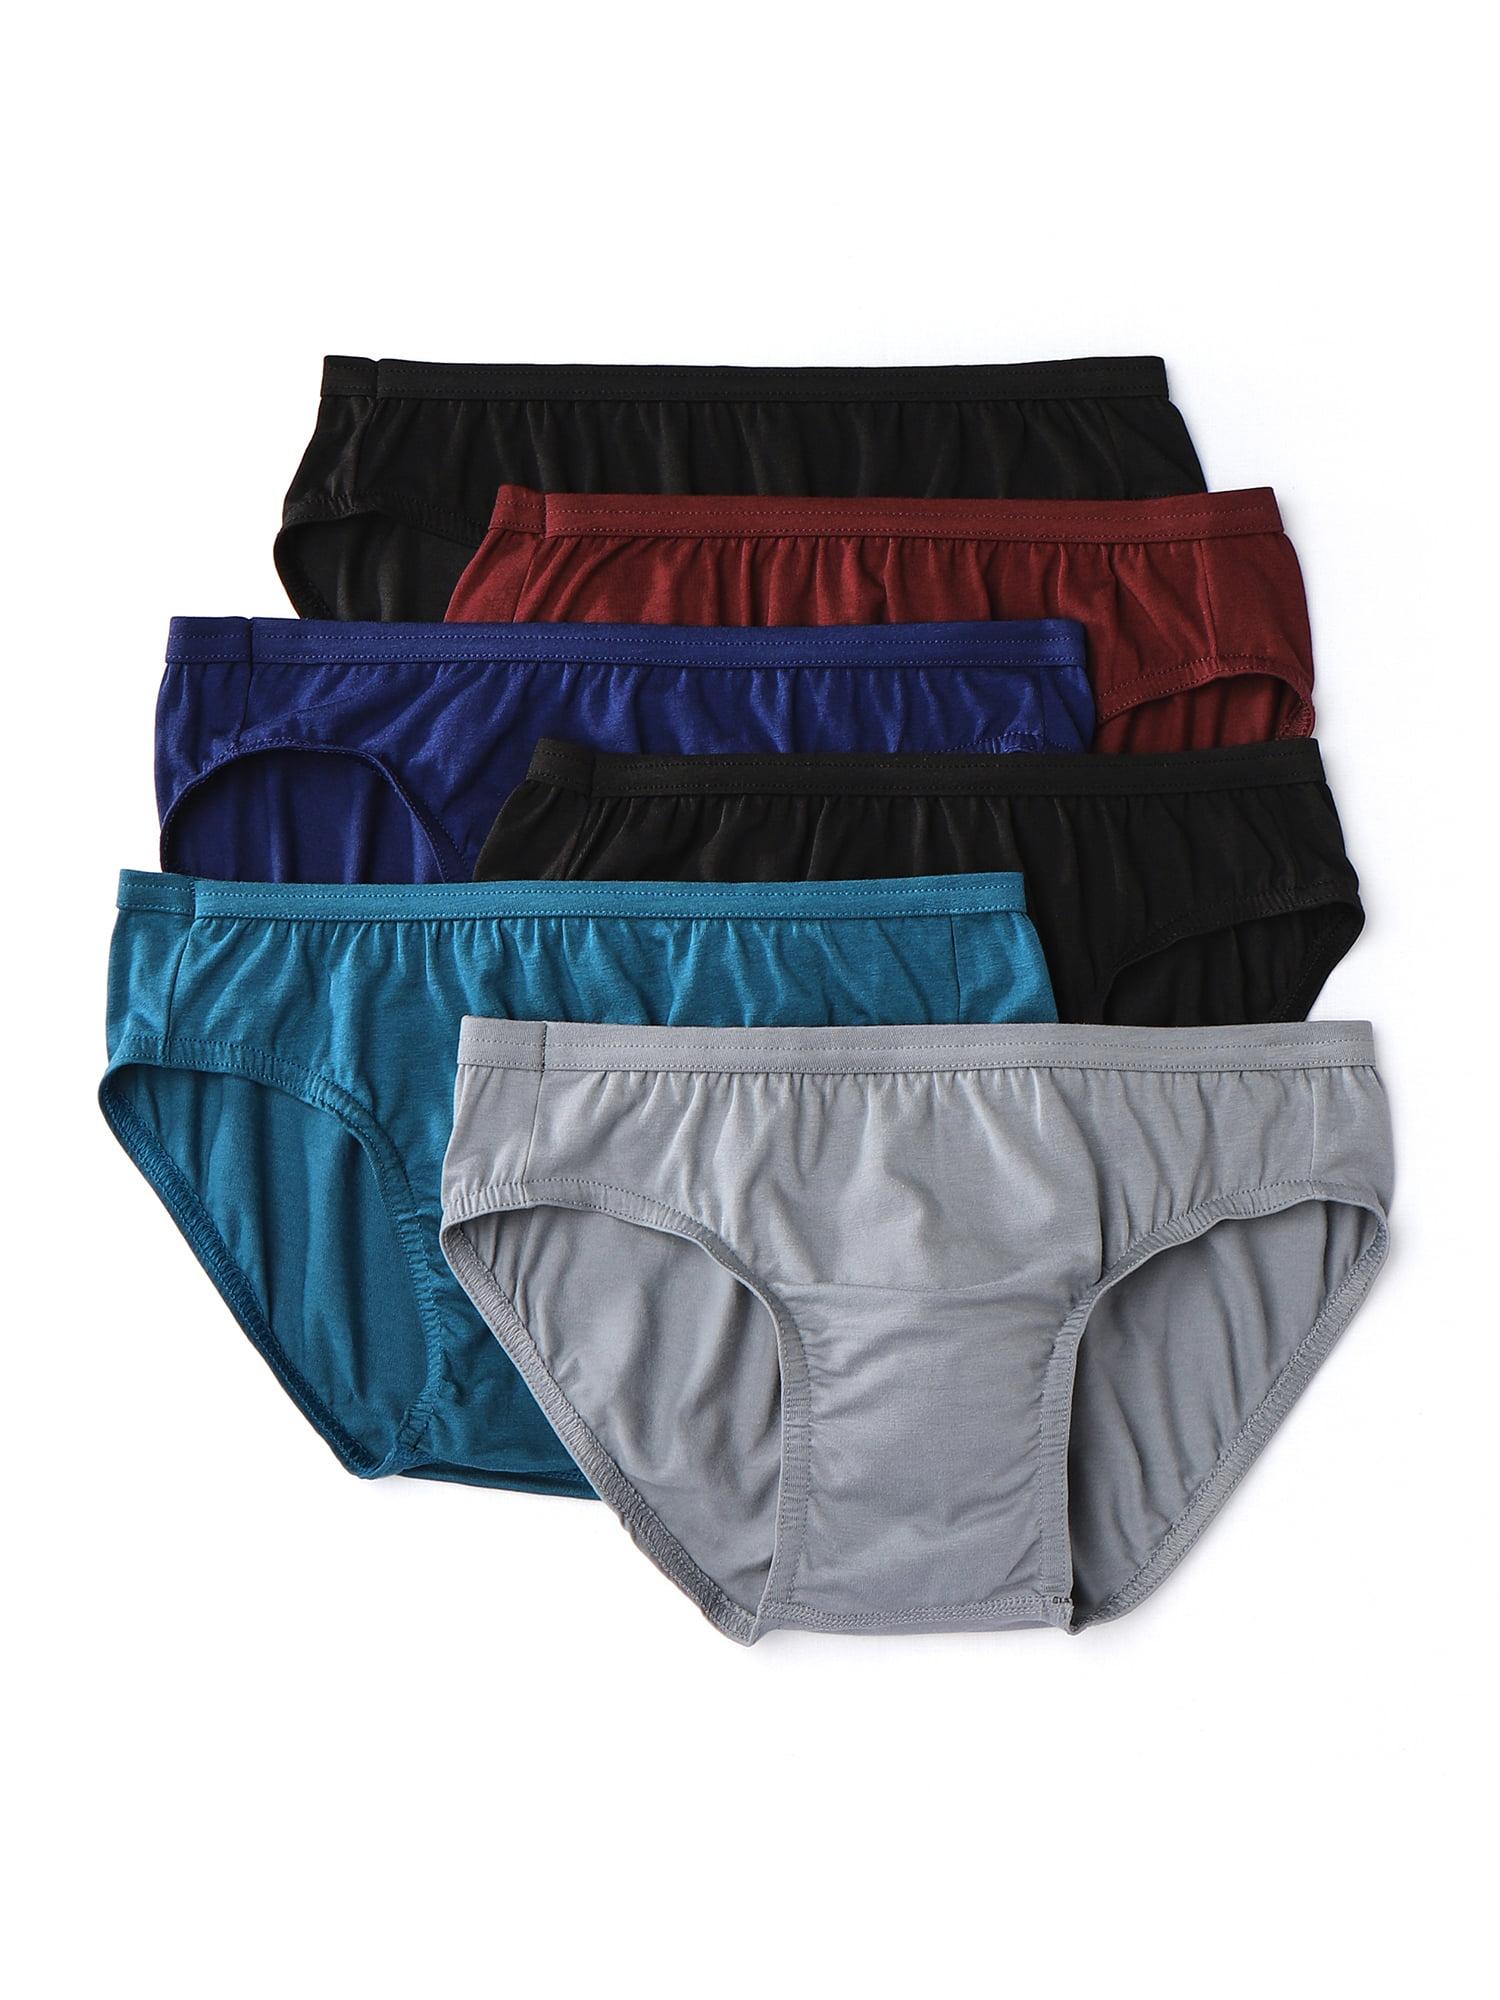 Hanes - Hanes Men's Comfort Flex Fit Tagless Bikinis, 6-Pack - Walmart.com  - Walmart.com